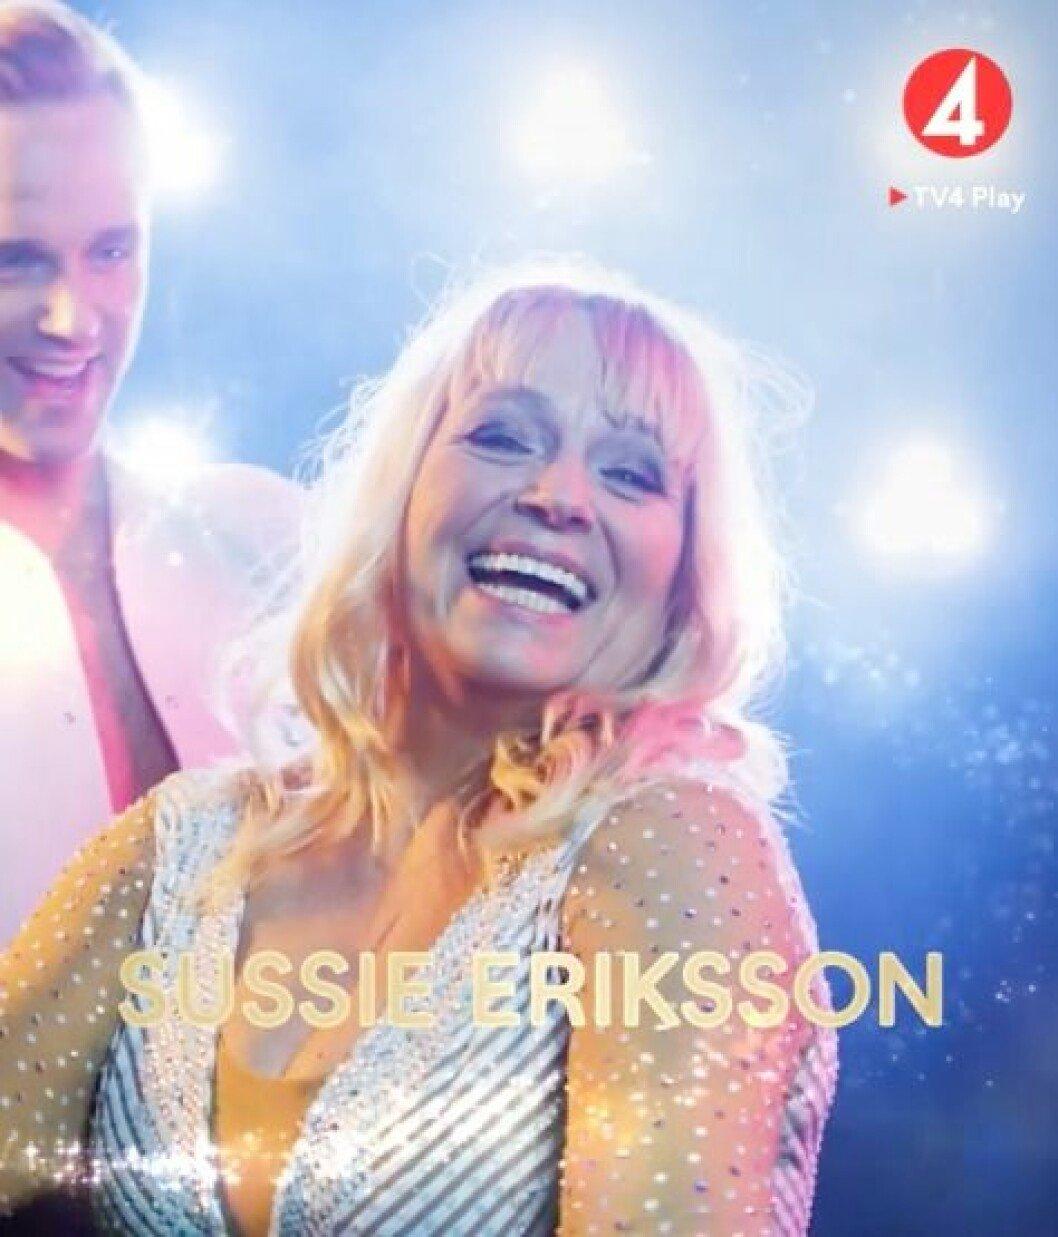 Sussie Eriksson I Let's dance